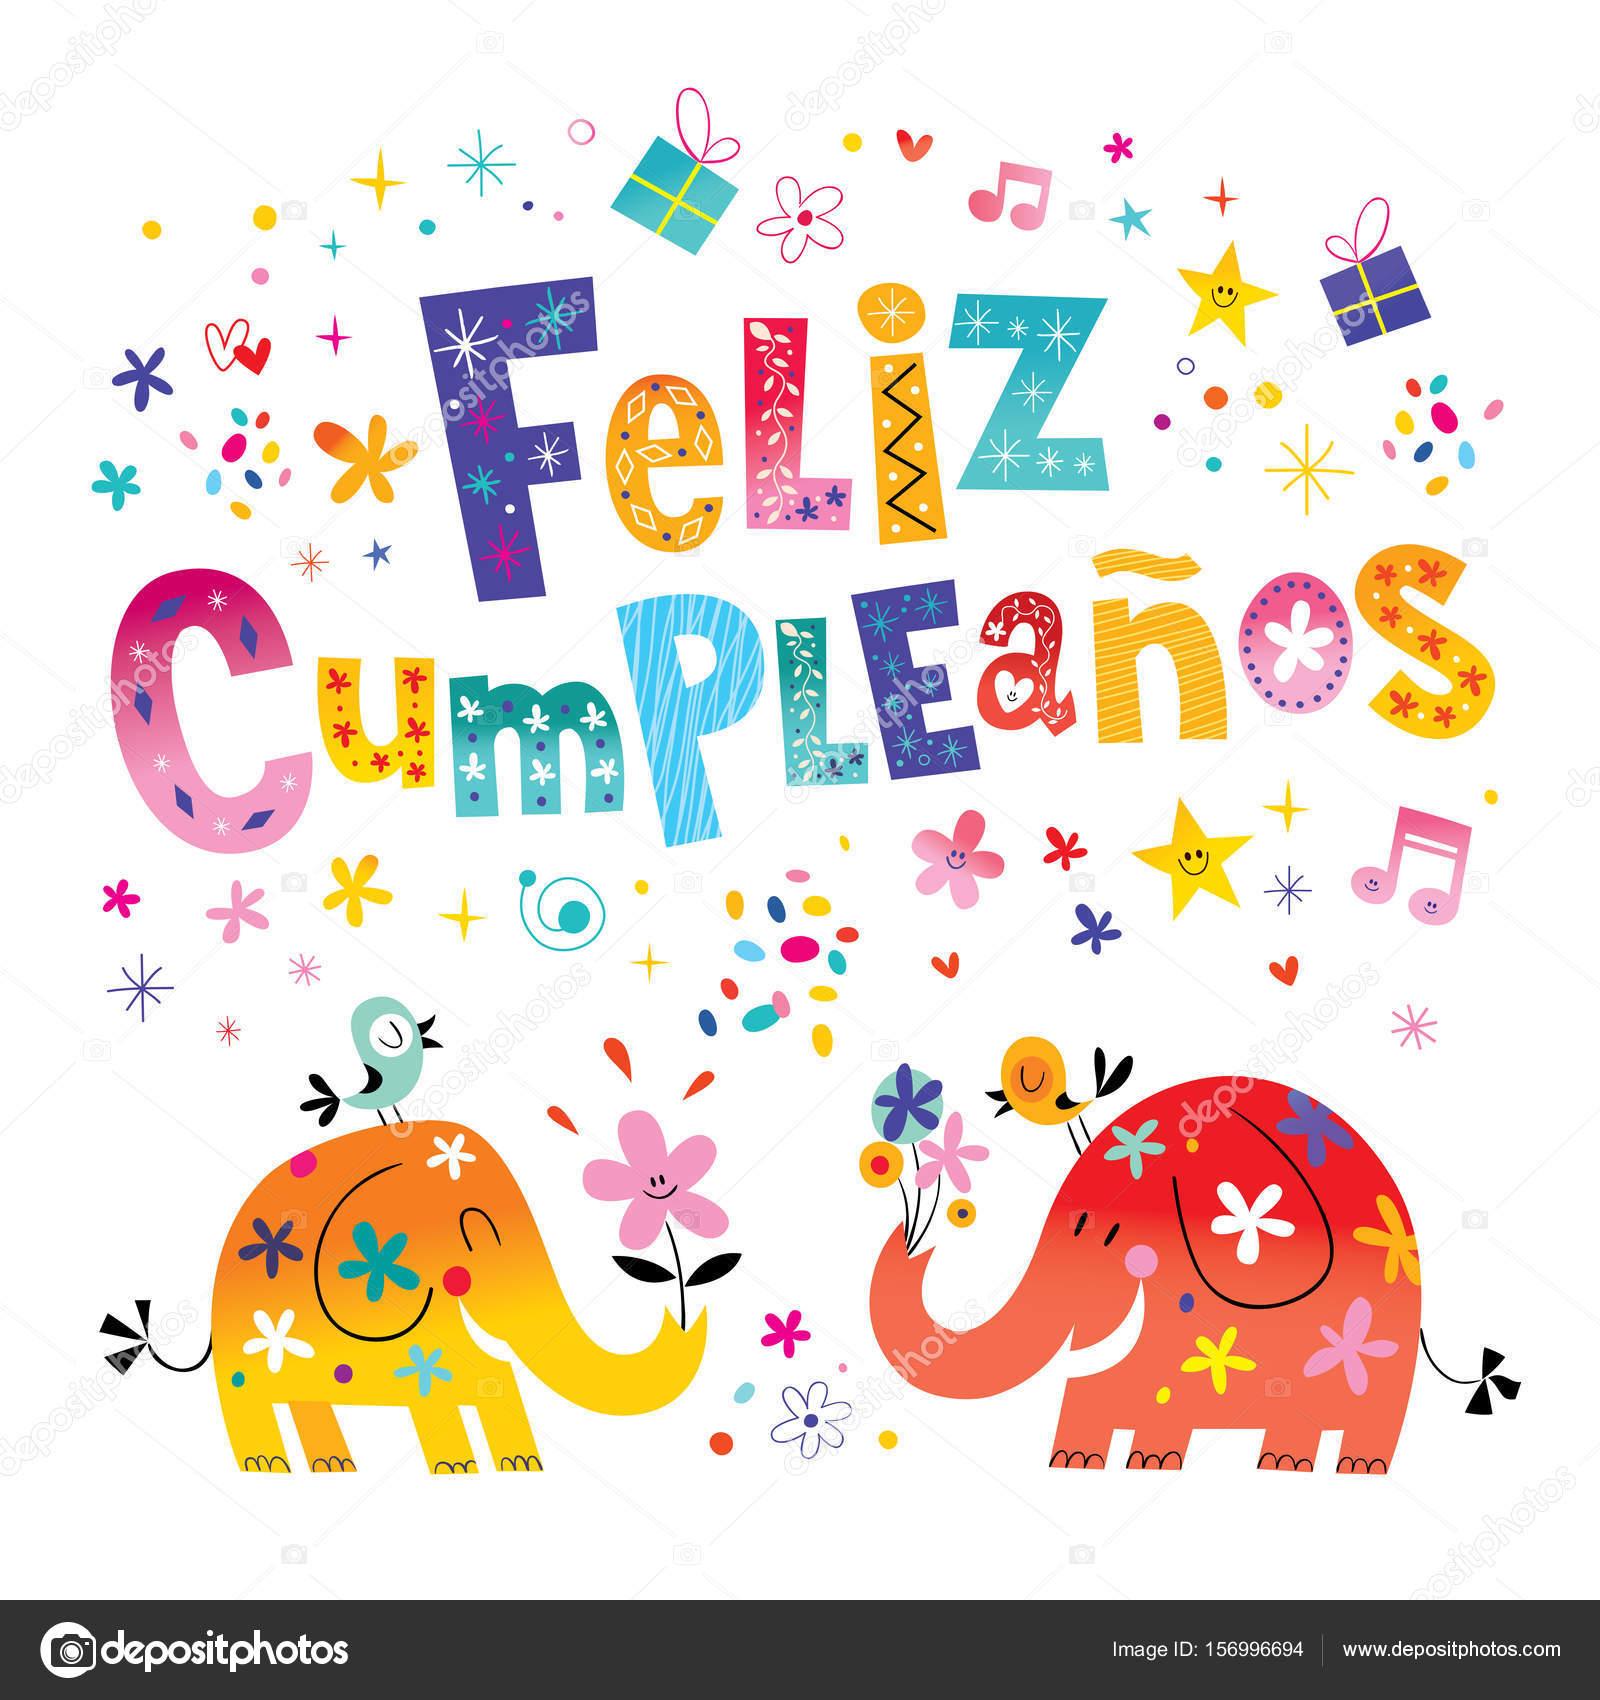 Feliz cumpleanos happy birthday in spanish greeting card with cute feliz cumpleanos happy birthday in spanish greeting card with cute elephants stock vector bookmarktalkfo Images